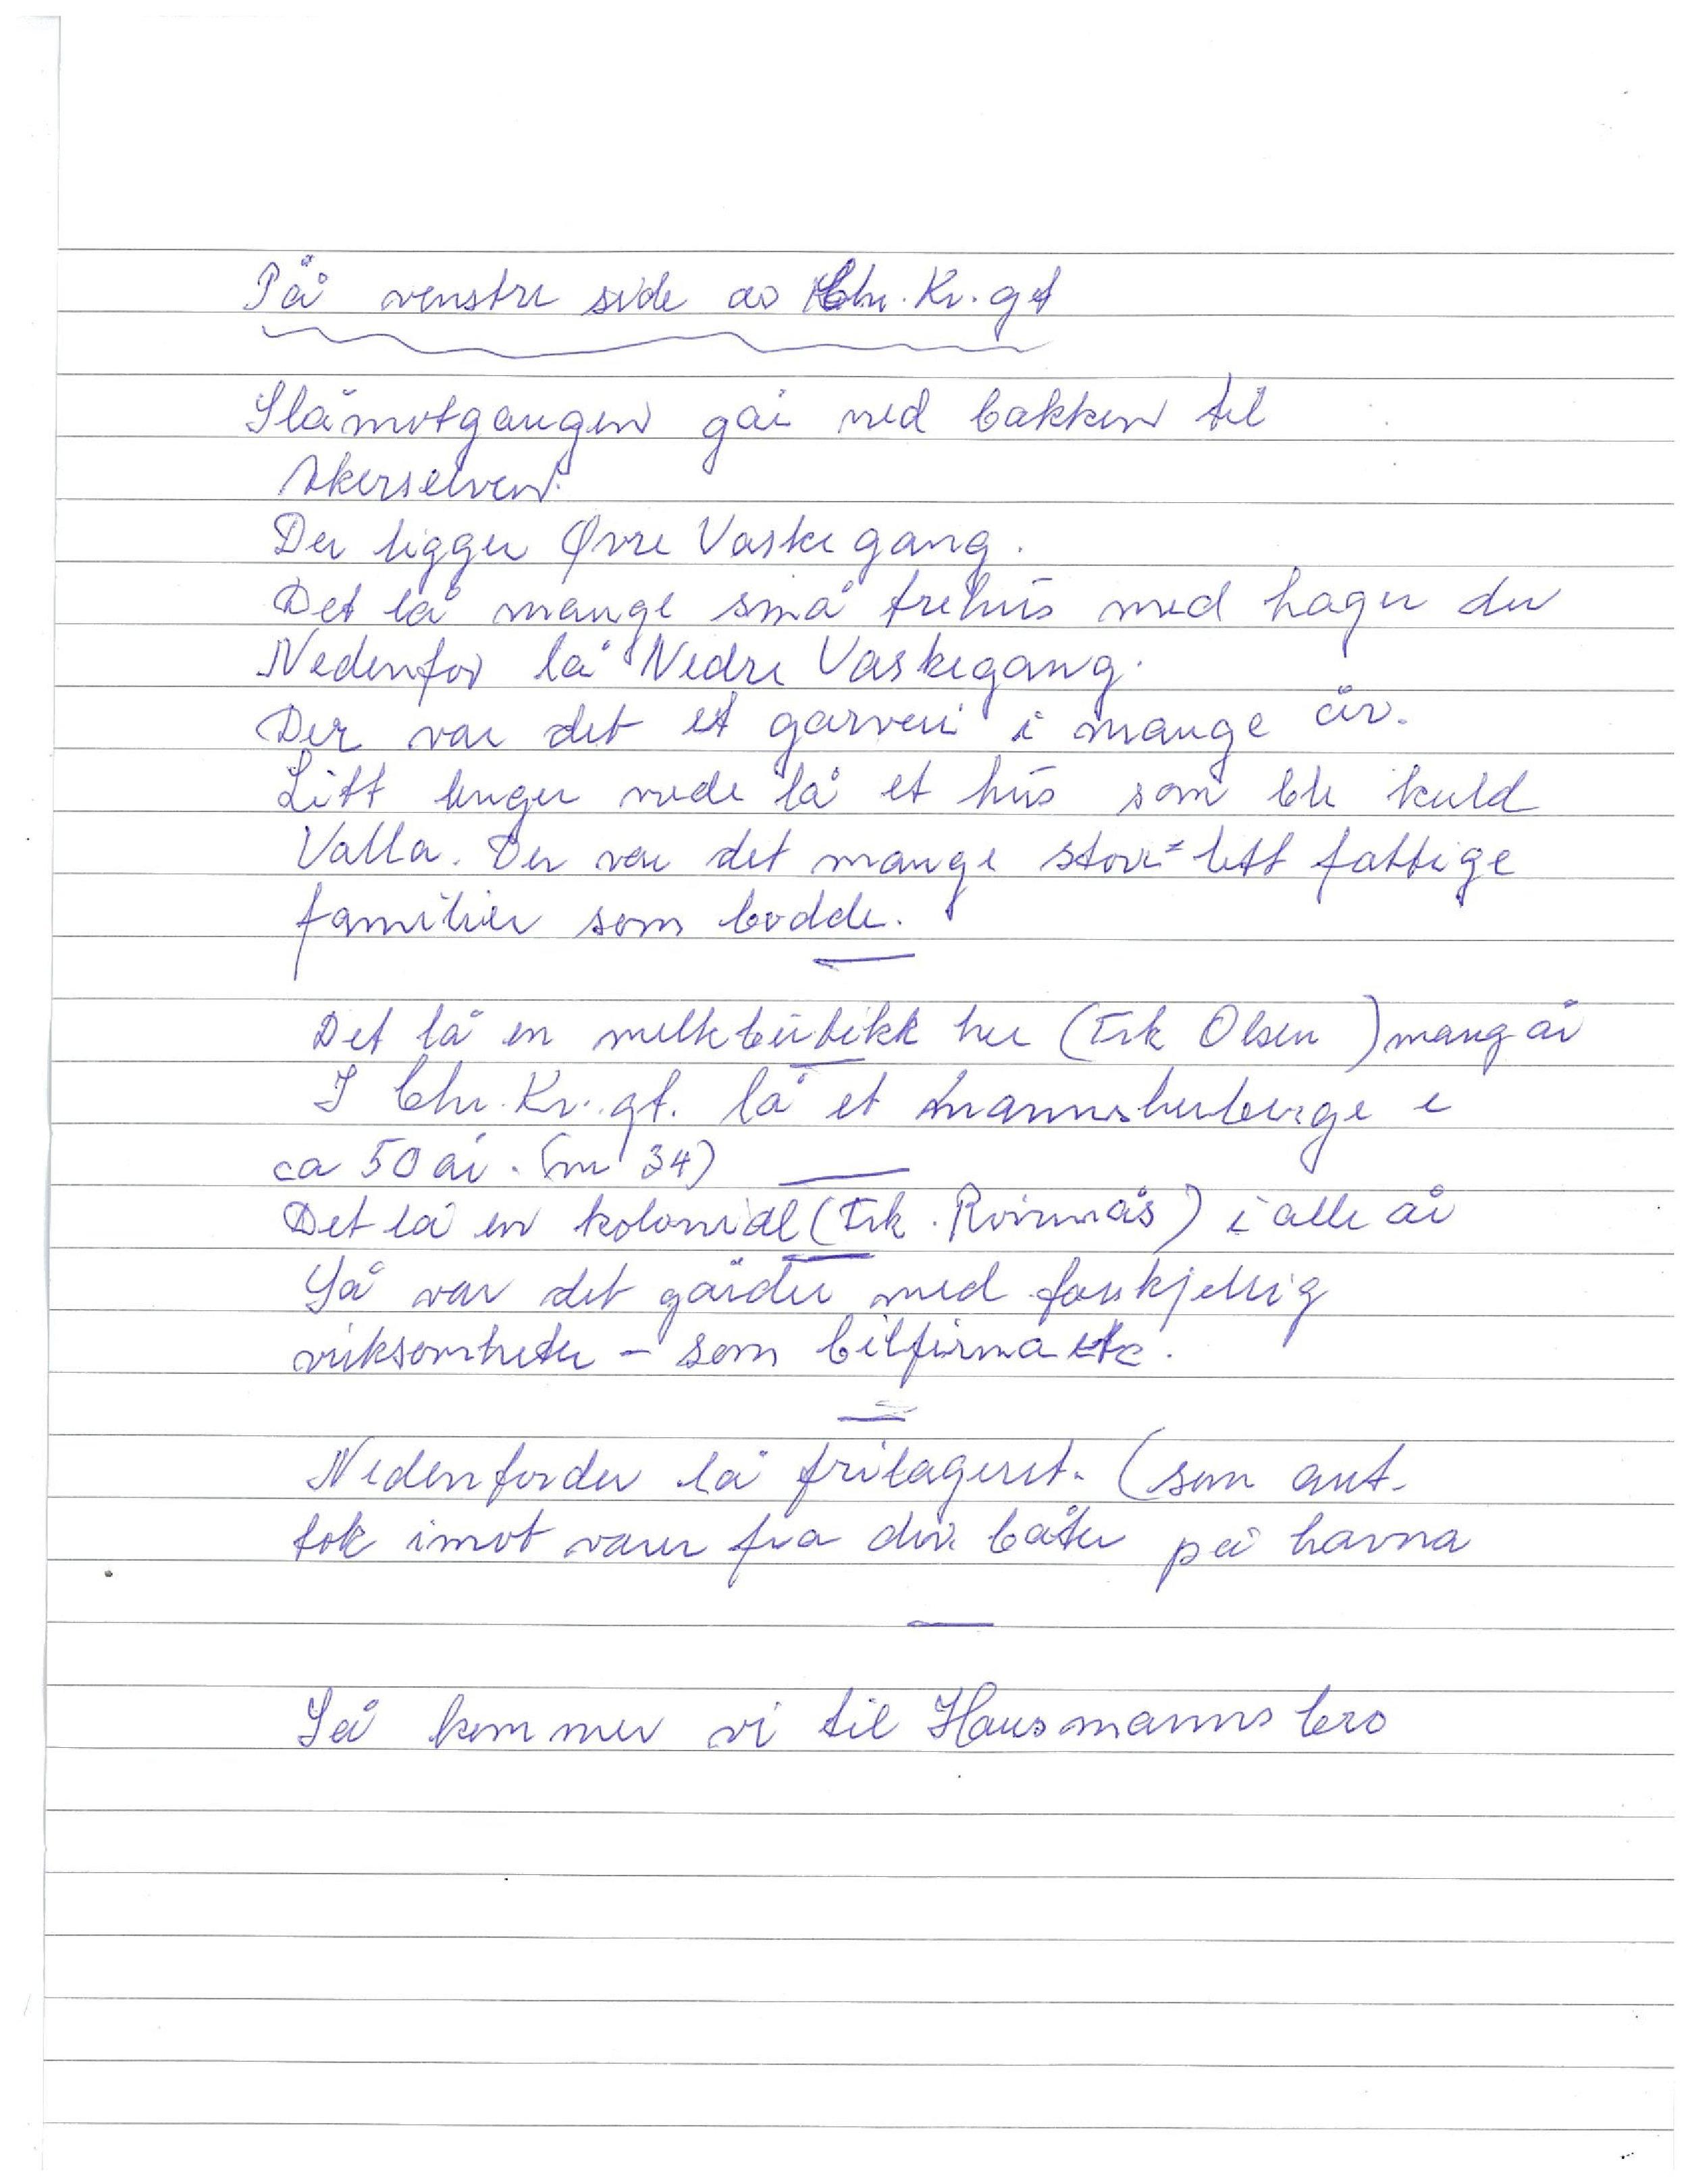 b-page-001.jpg